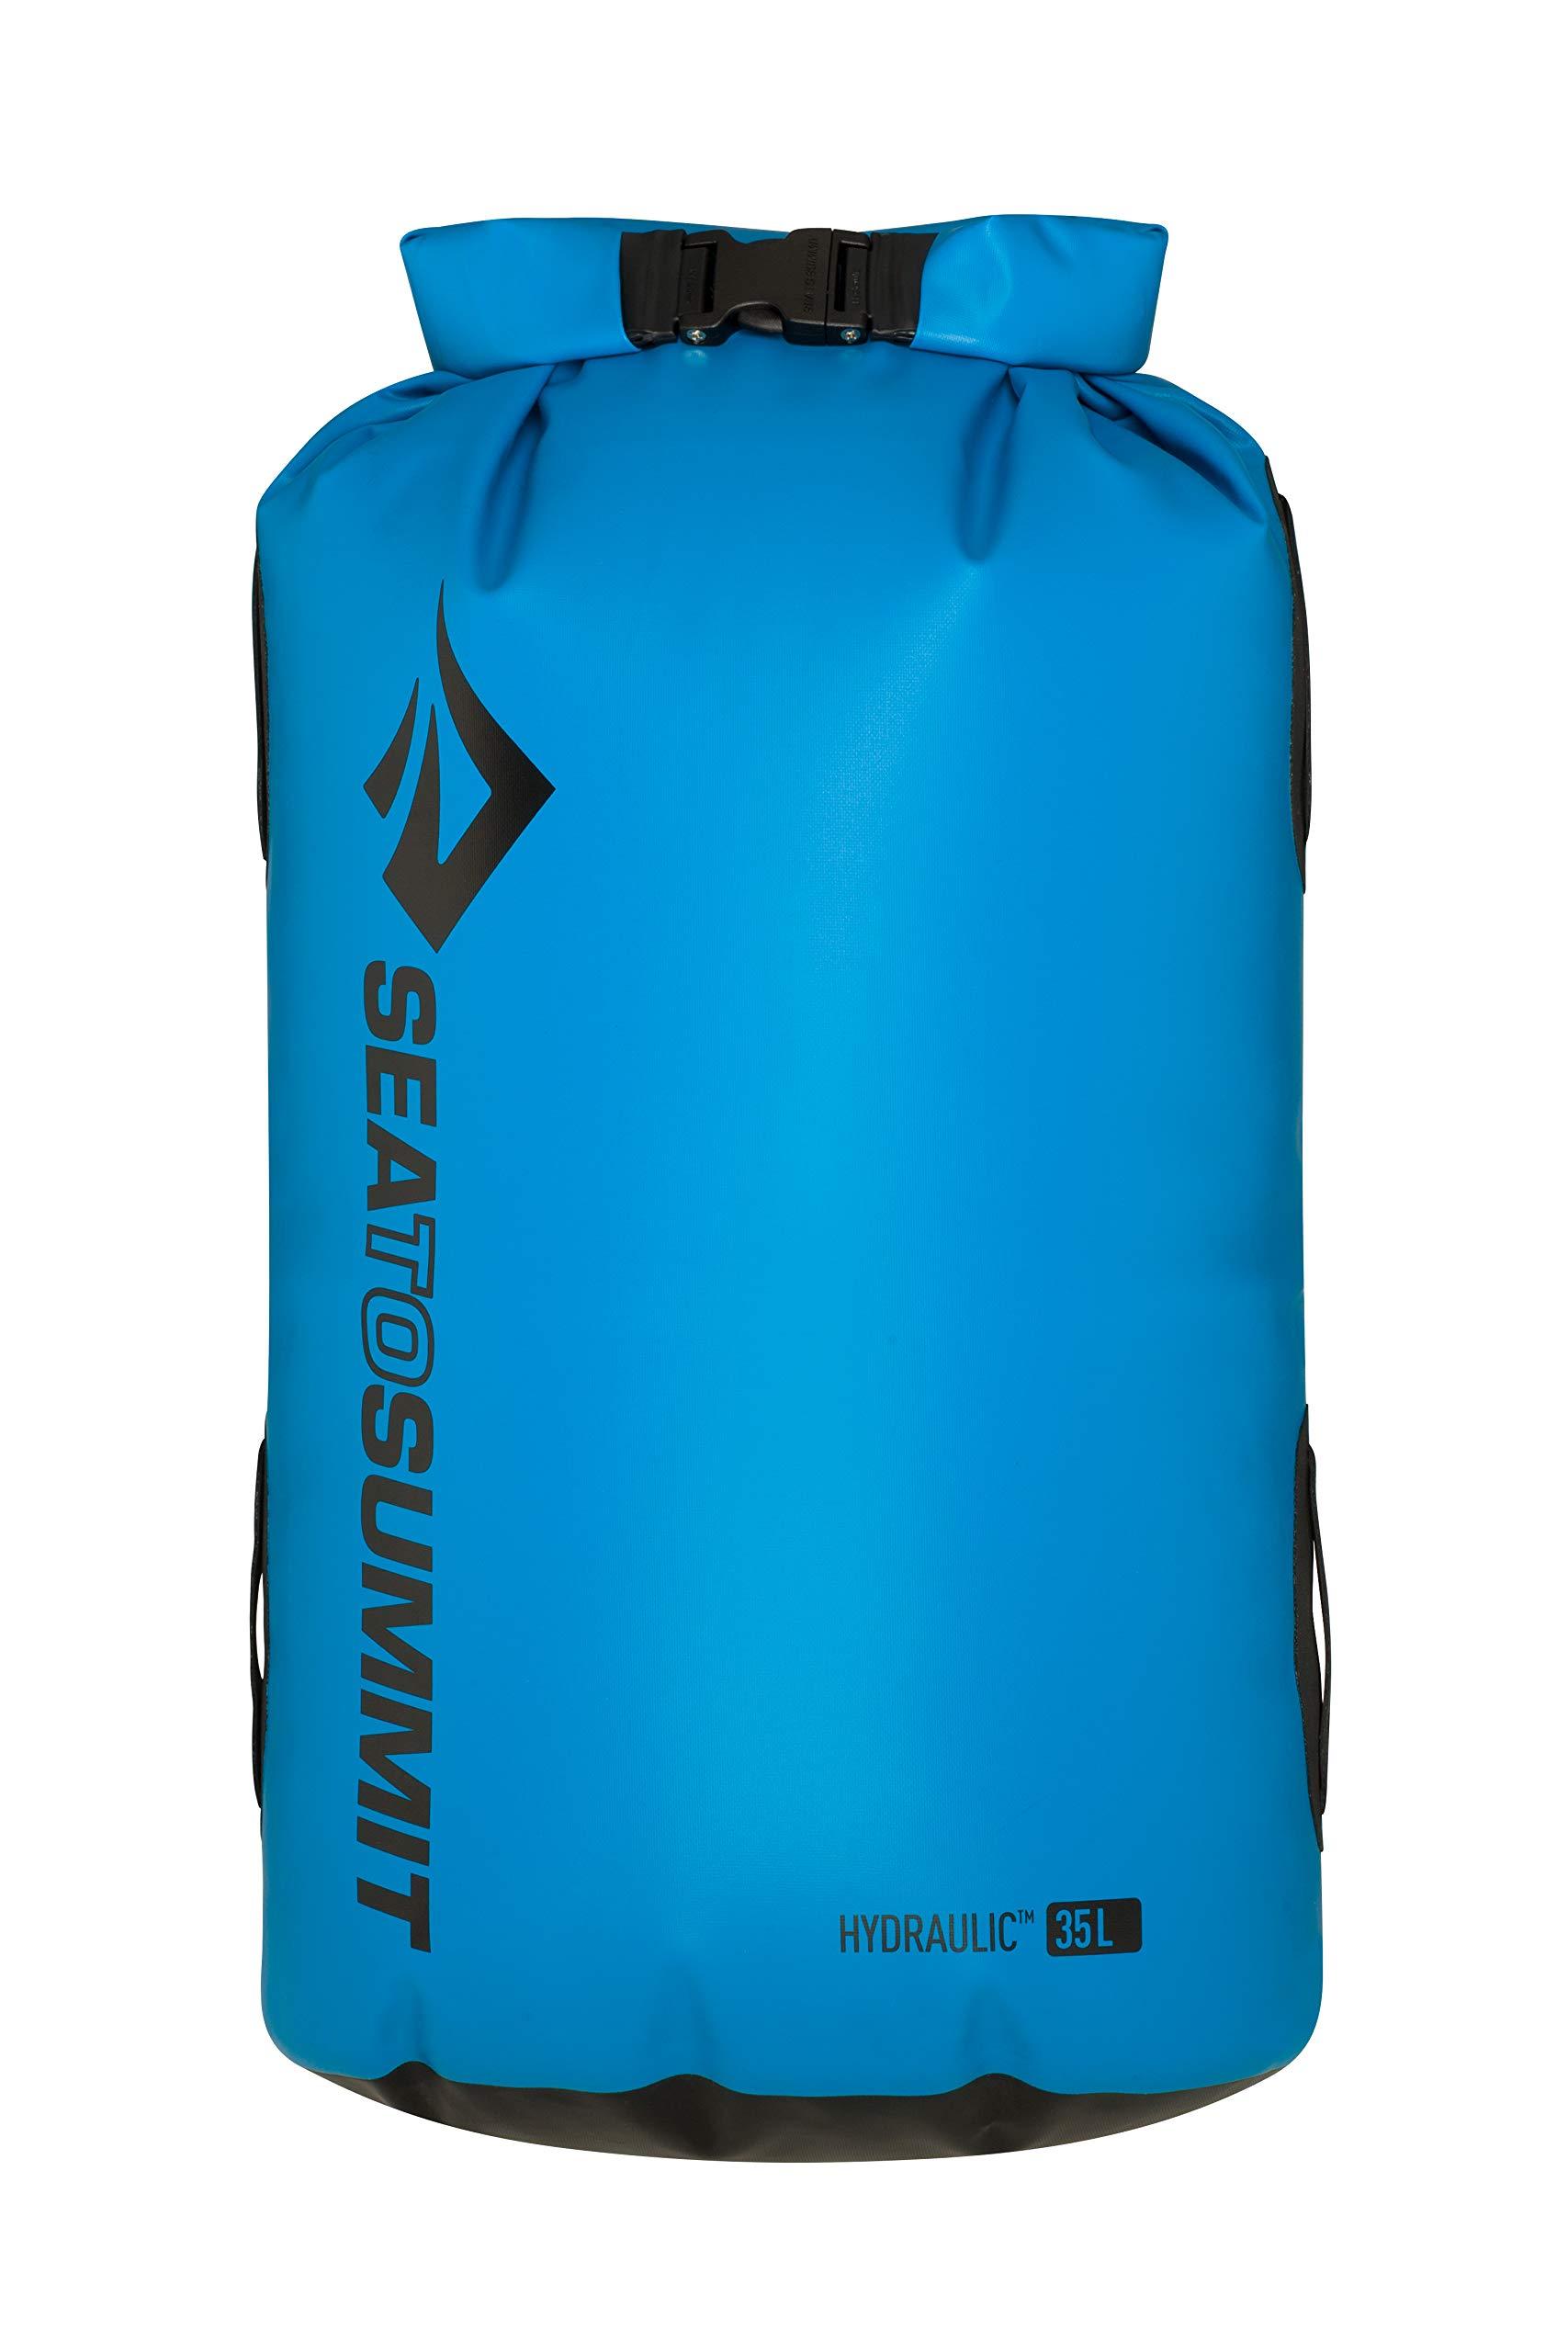 Sea to Summit Hydraulic Dry Bag, Blue, 35 Liter by Sea to Summit